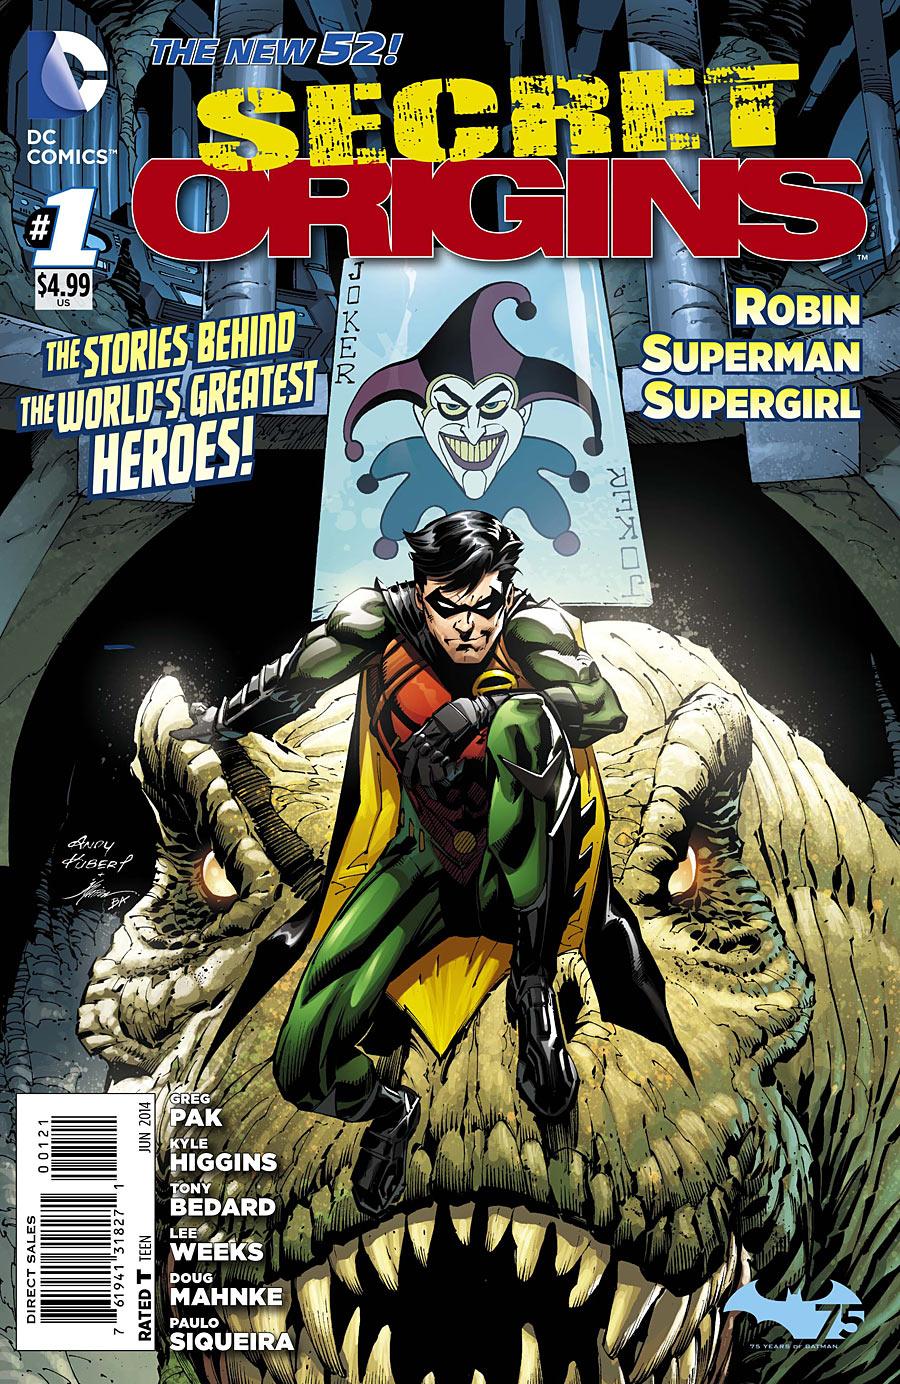 Secret Origins #35 Vol 3